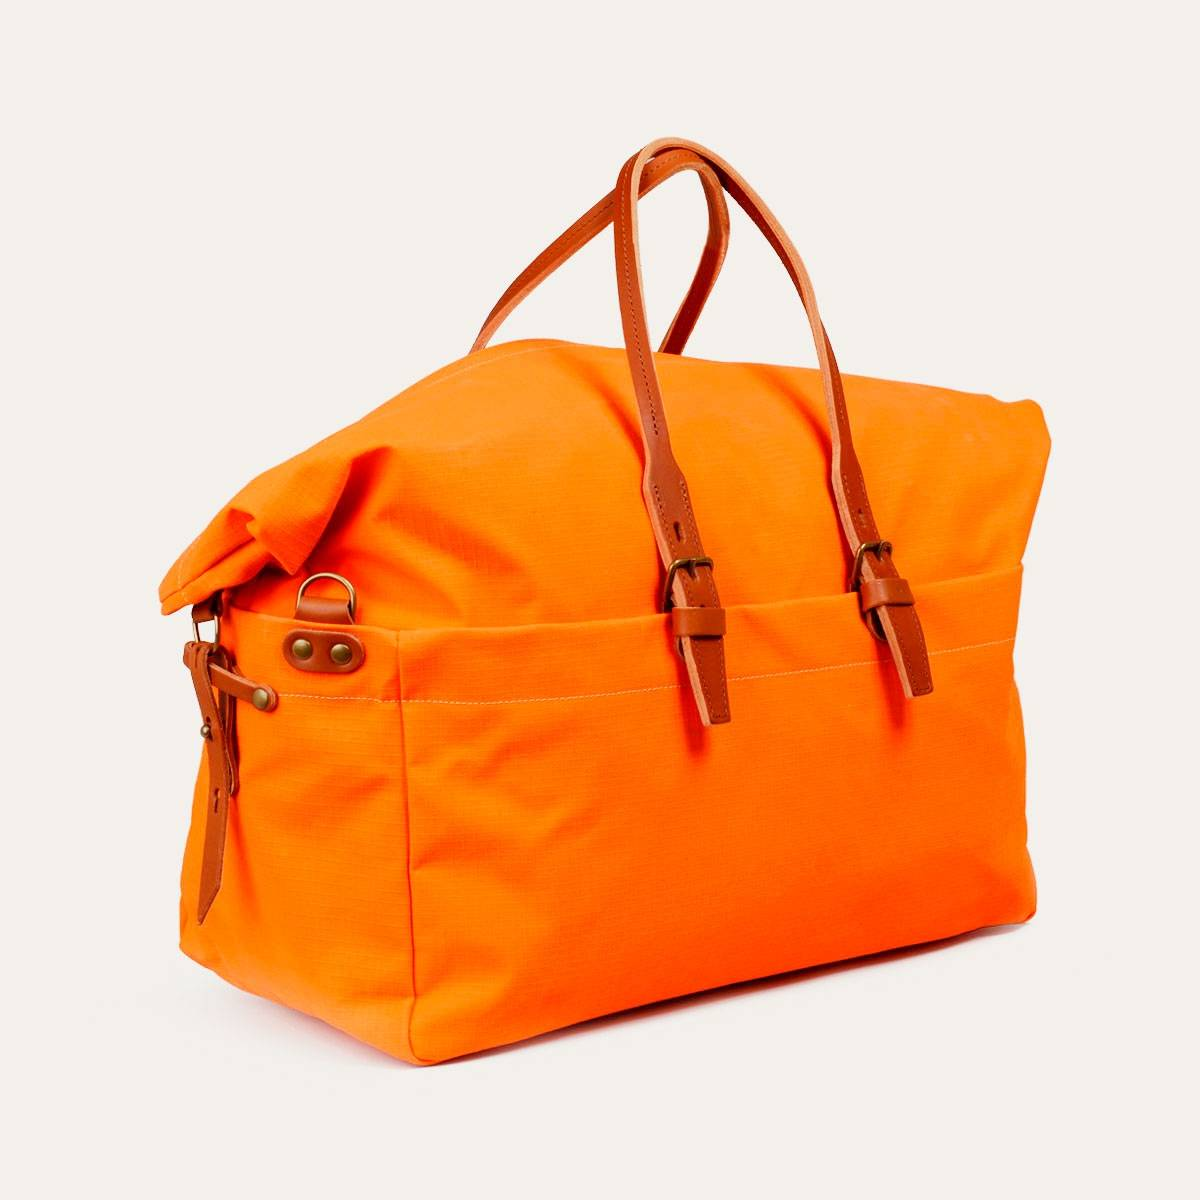 Cabine Travel bag - Regentex orange (image n°3)